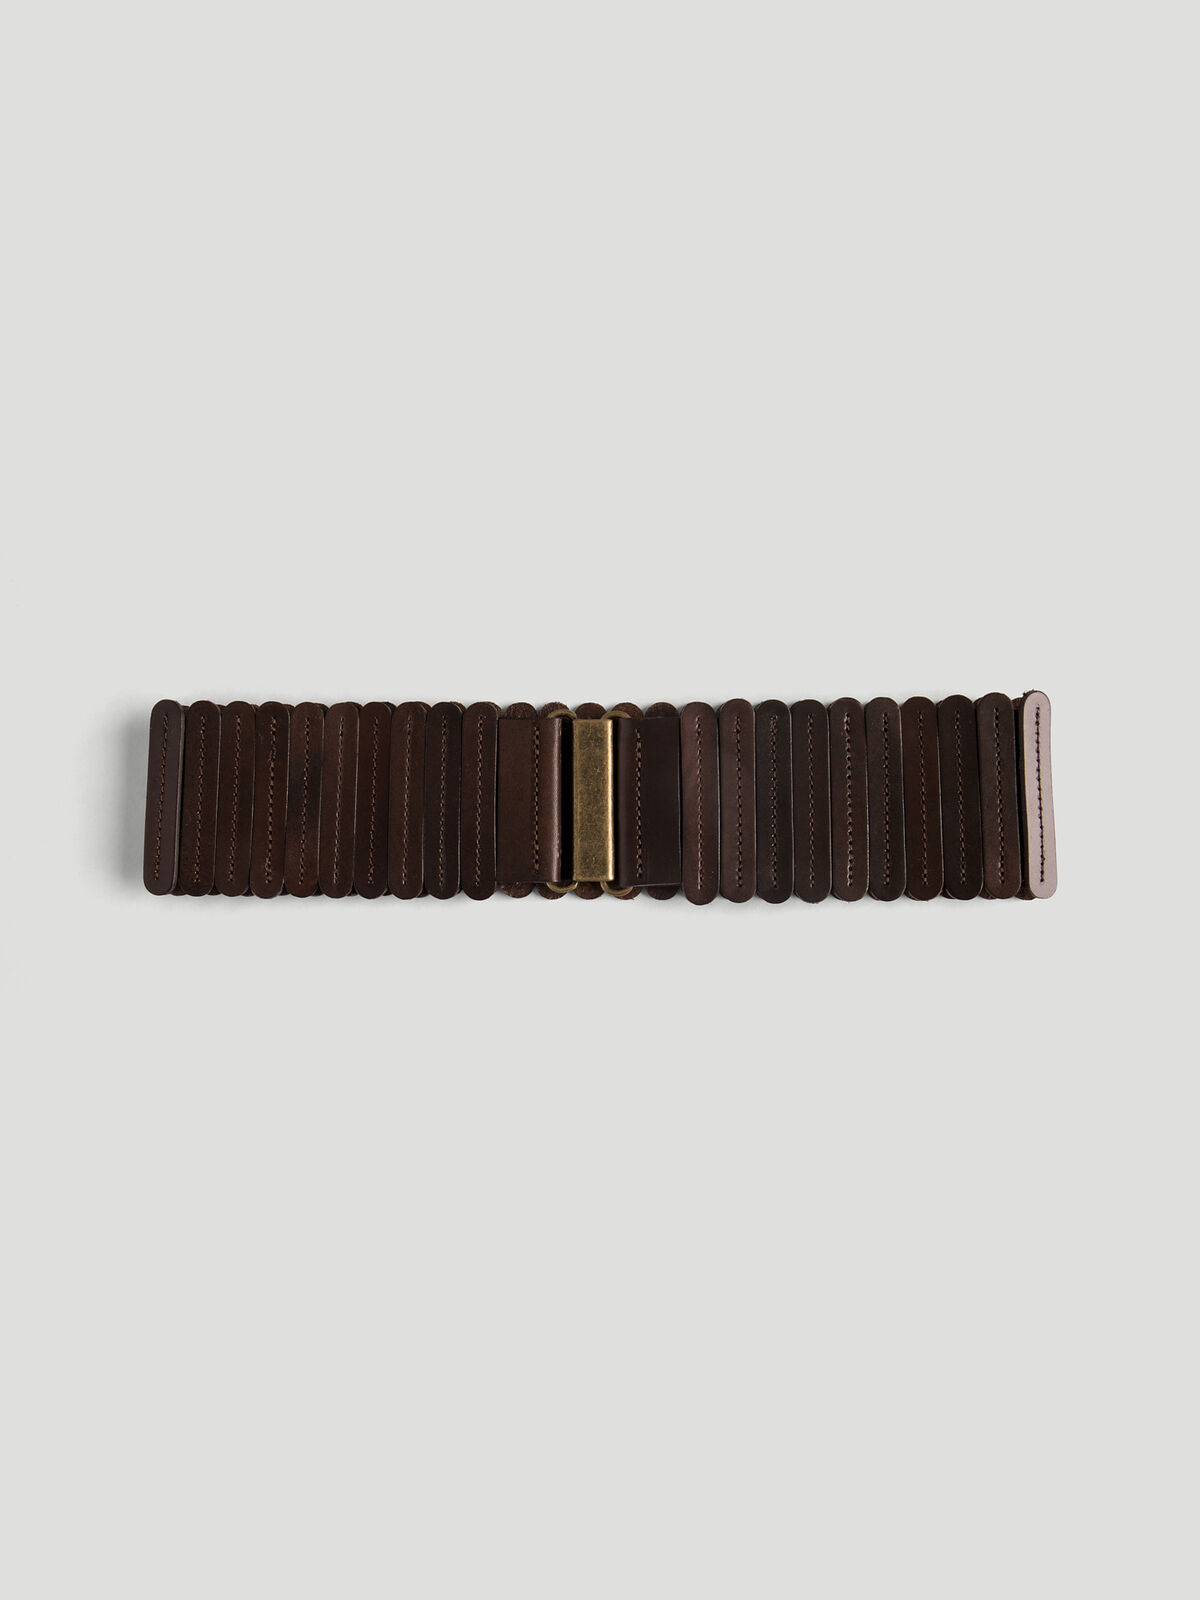 Stretch Stitched Belt